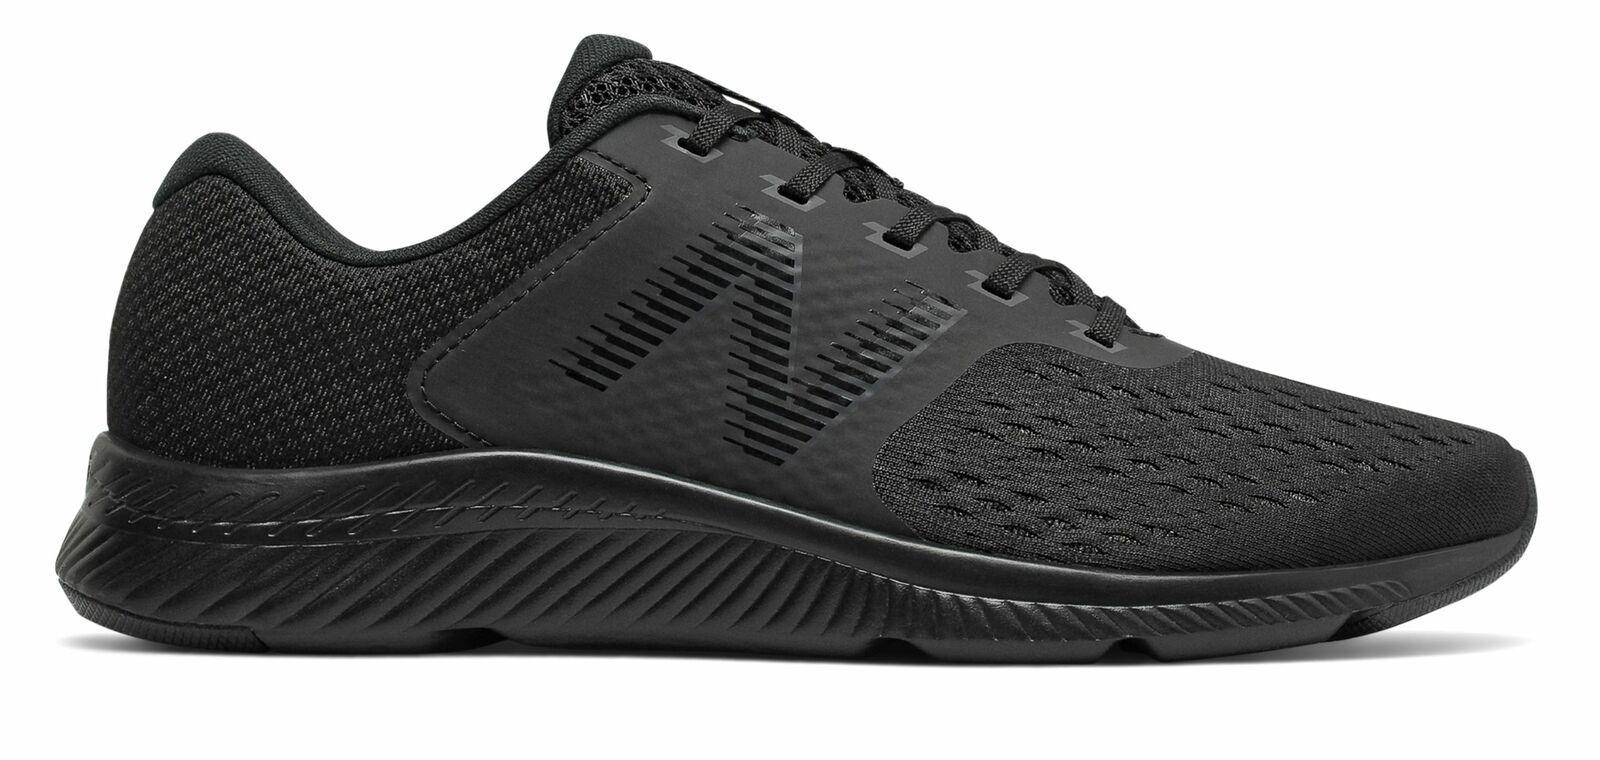 New Balance Men's DRFT Shoes Black   eBay   Black shoes, New ...